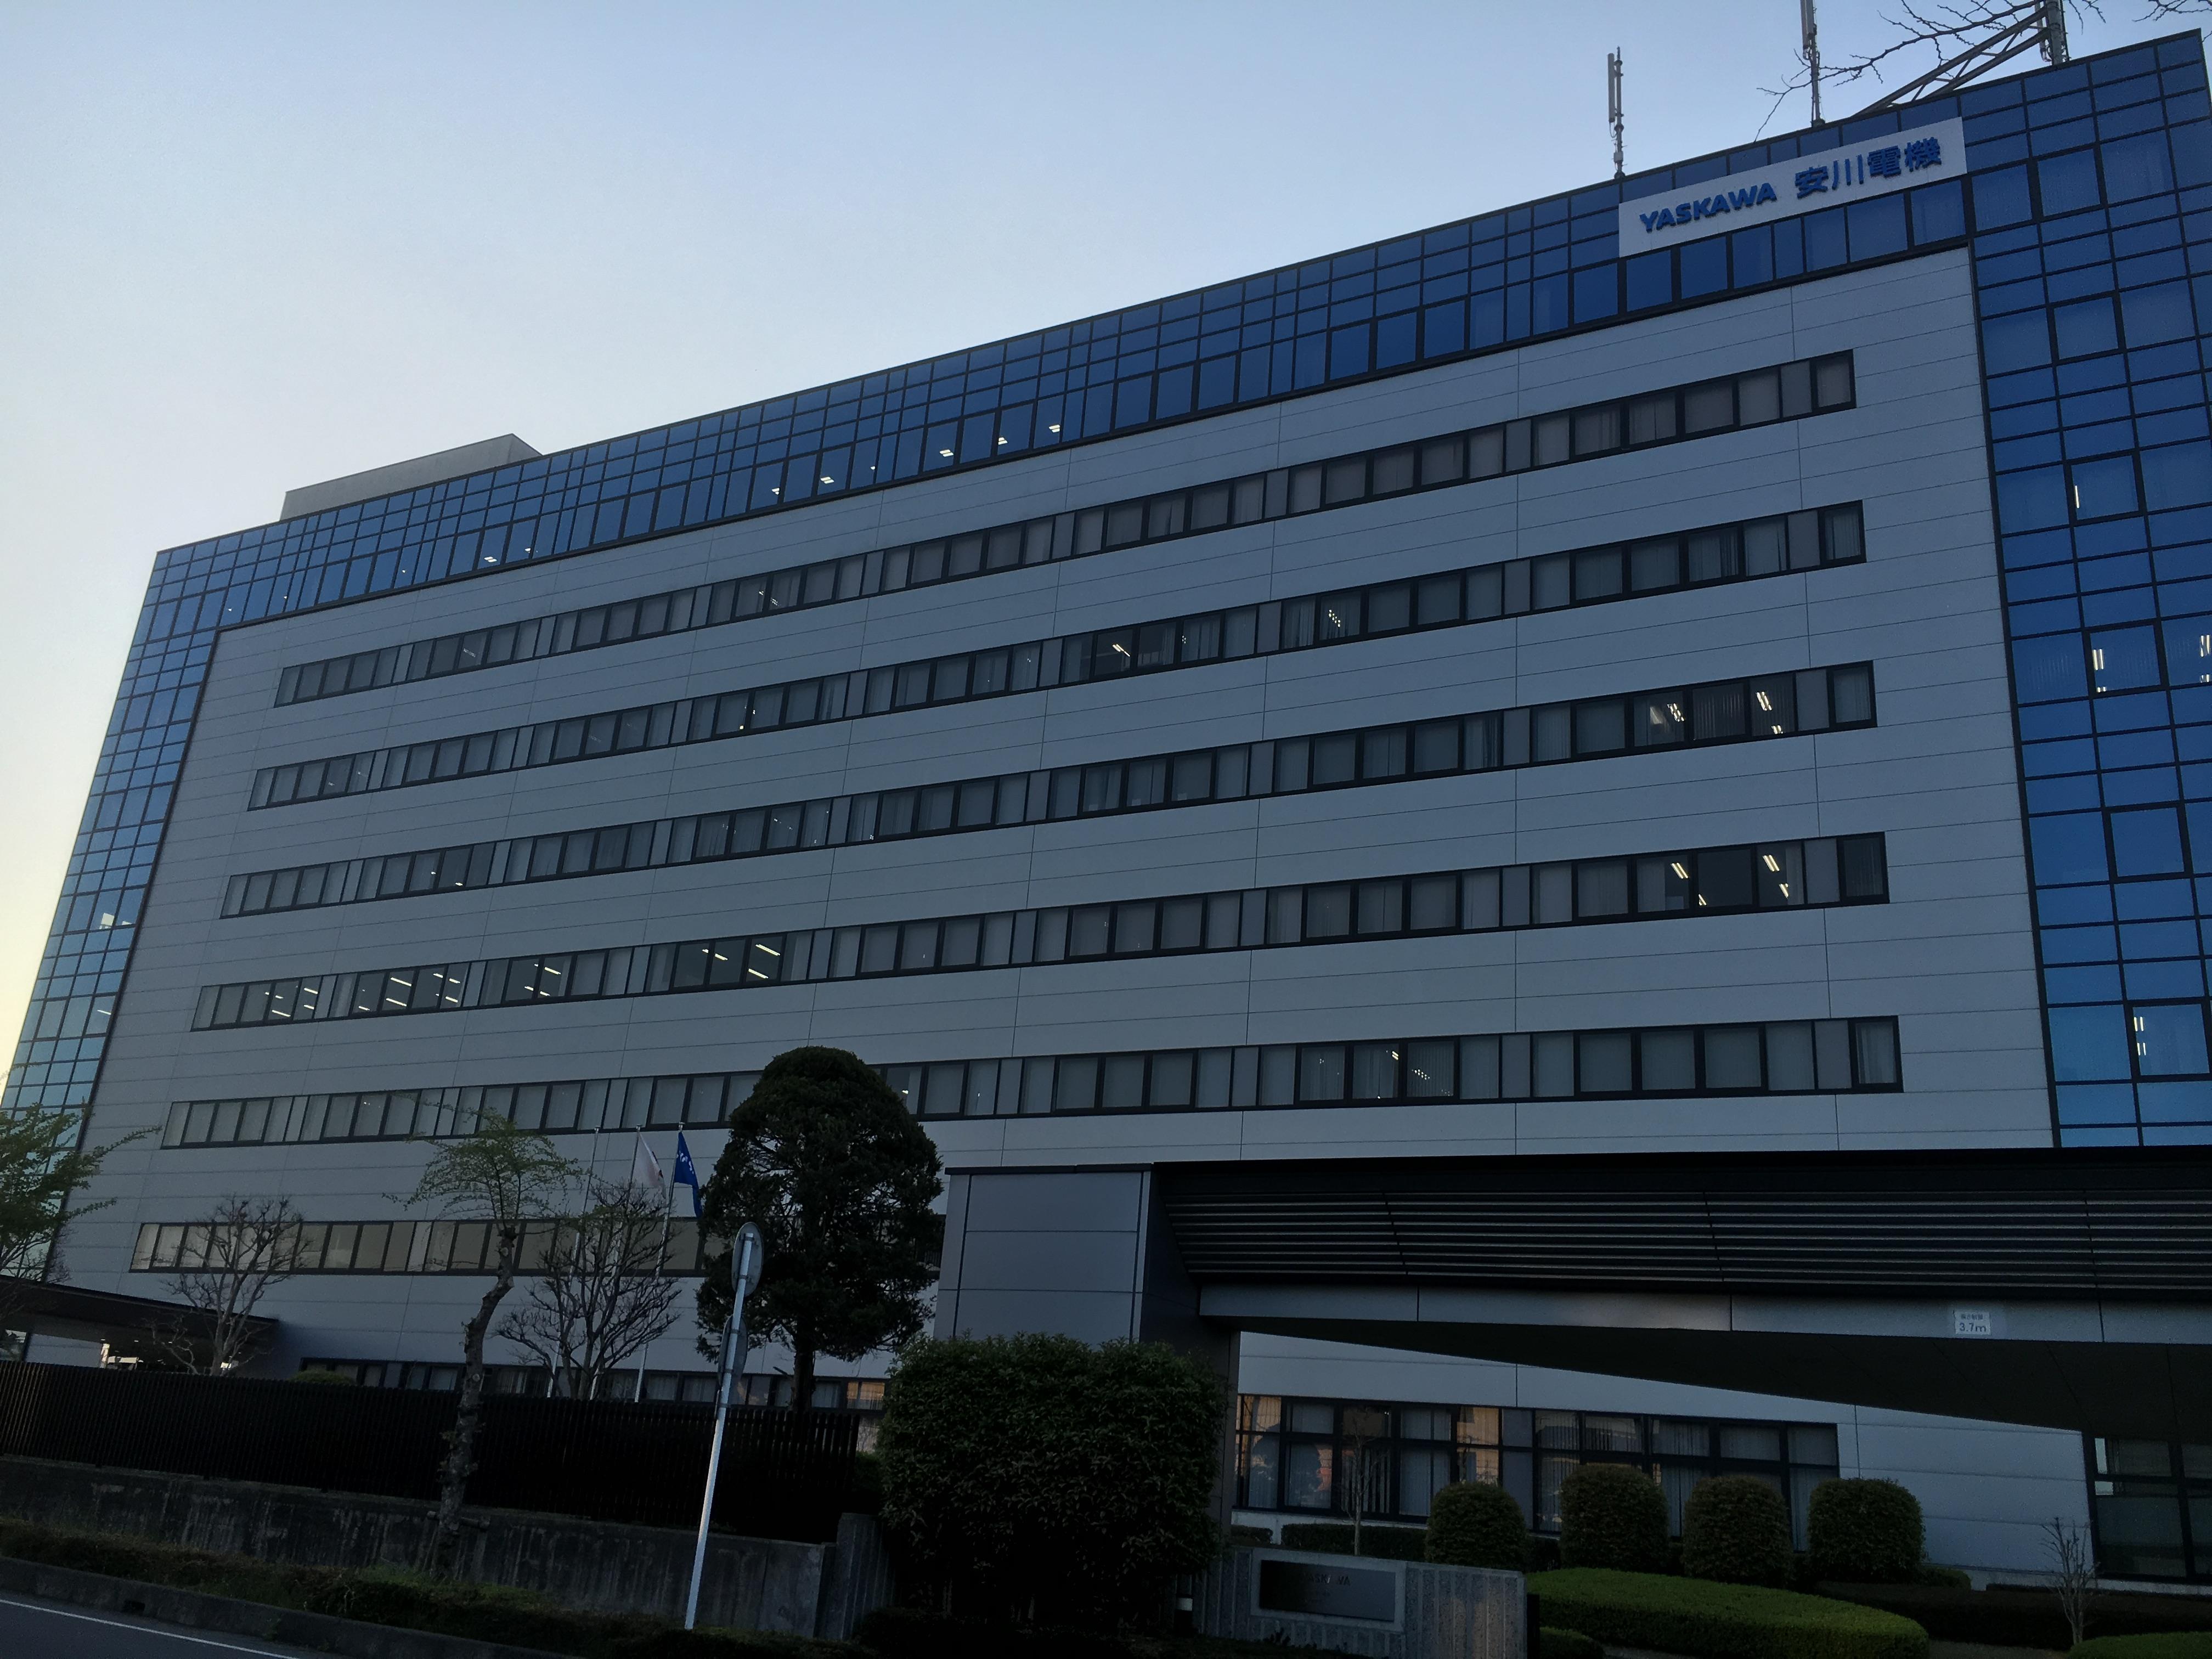 Headquarters of Yaskawa corporation in Japan